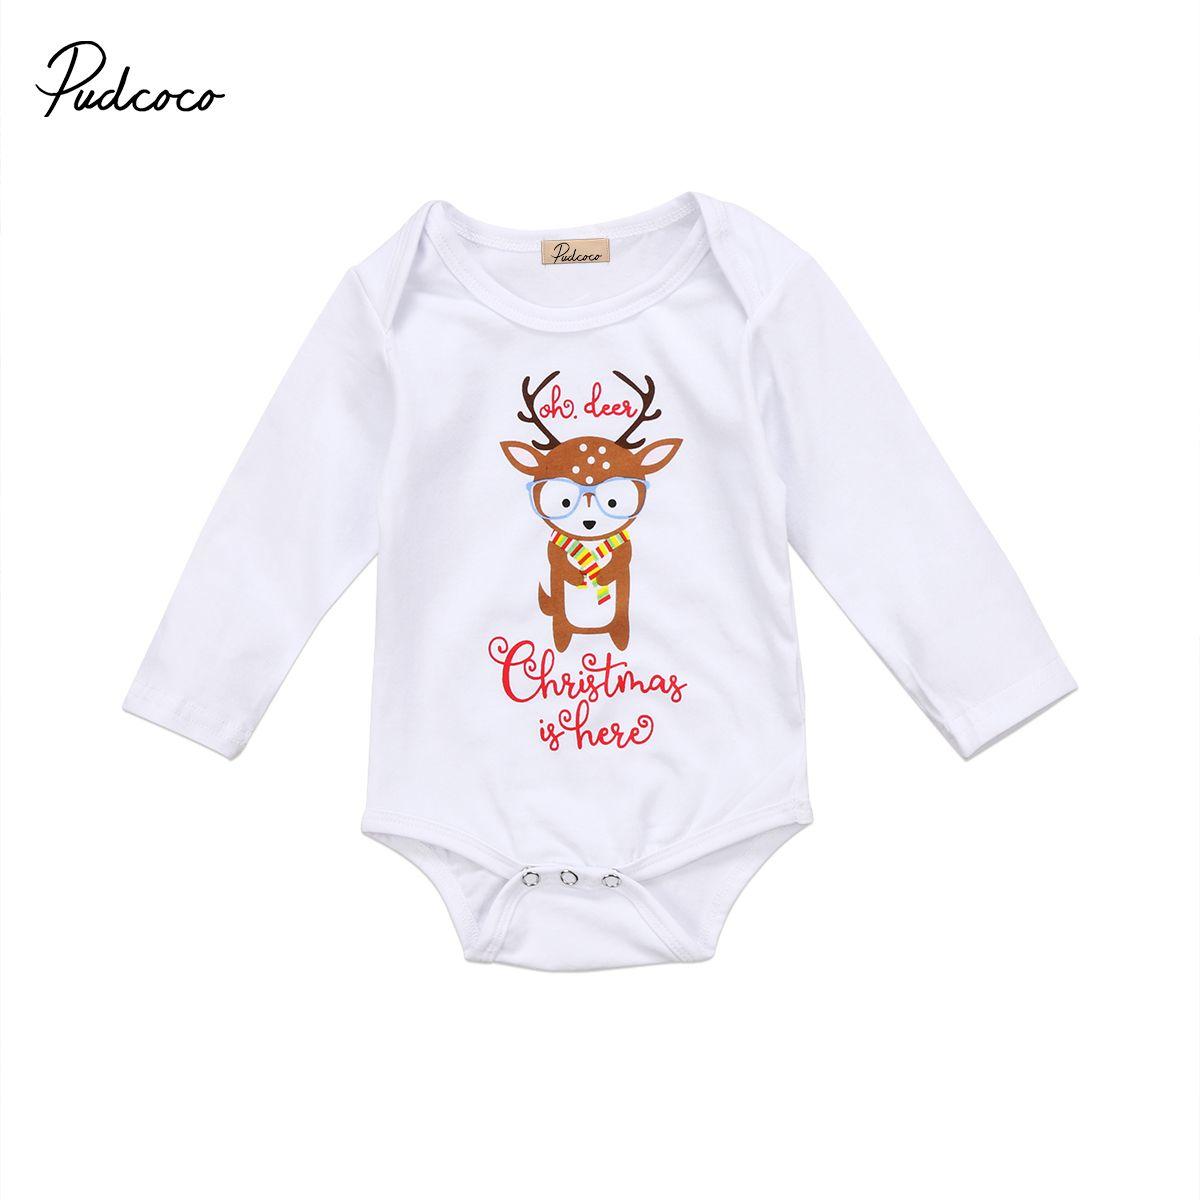 3e308b2a4cb4 2019 Xmas Baby Boy Girl Clothes Cartoon Christmas Deer Pattern ...